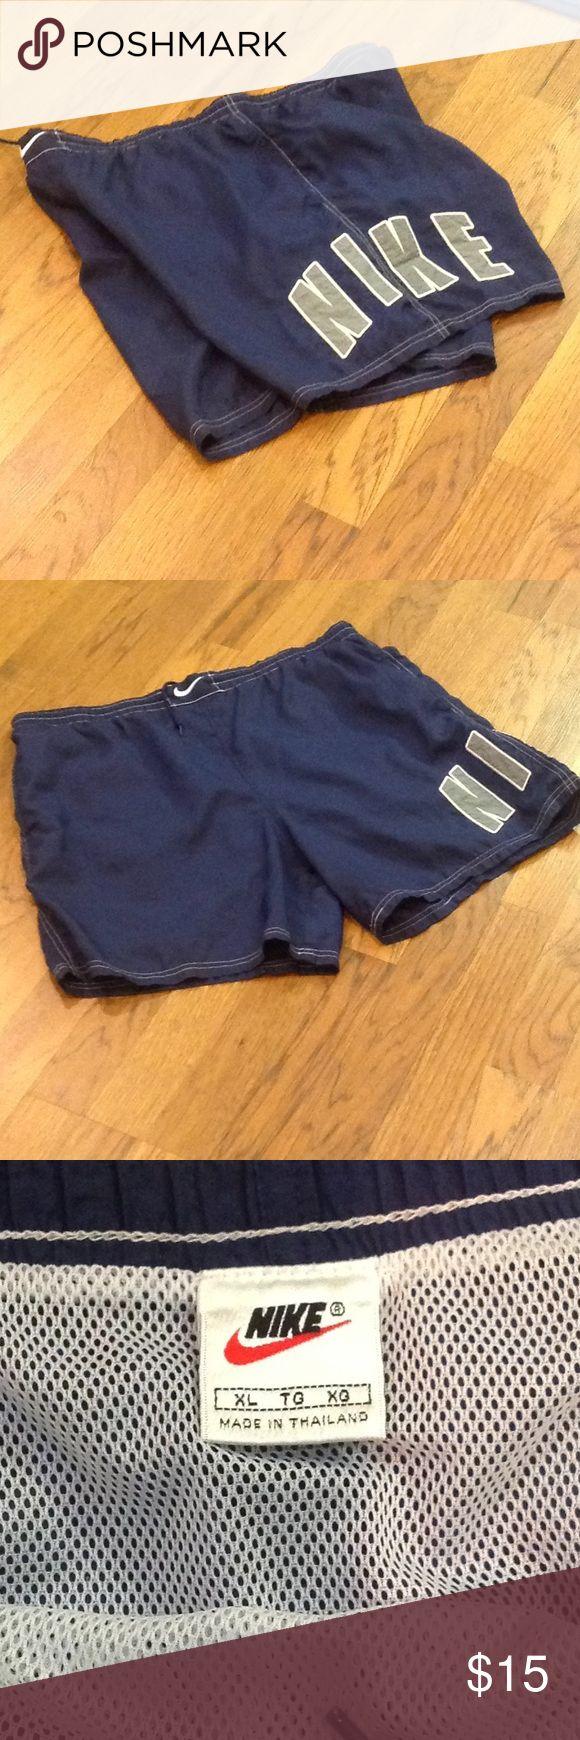 MENS NIKE SWIM SHORTS. NAVY BLUE MENS NIKE SWIM PANTS IN GREAT WORN CONDITION.🏊🏻 Nike Shorts